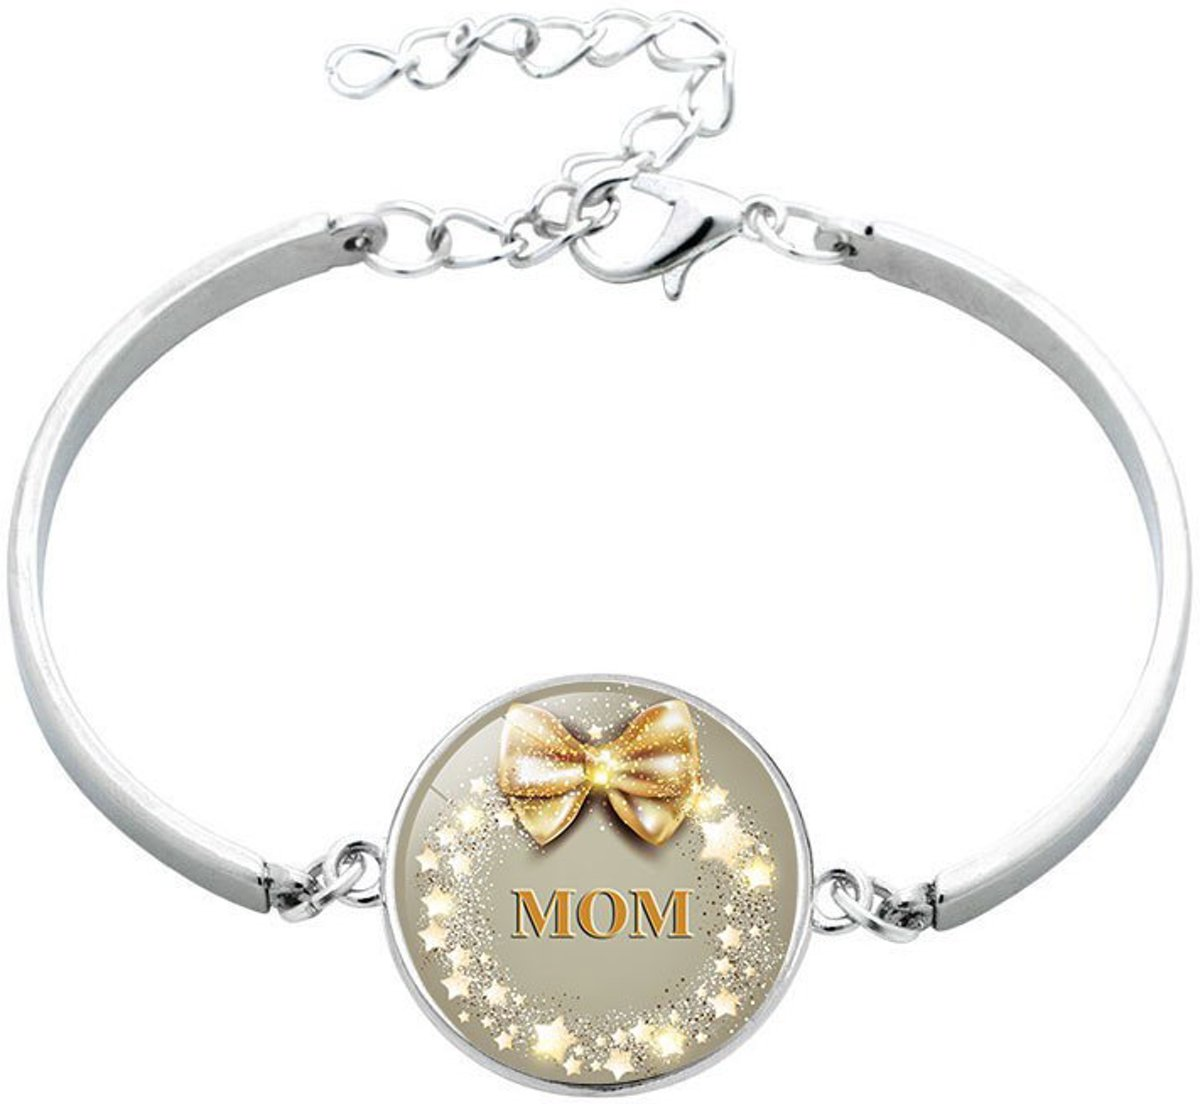 Mama armband - mom - valentijnscadeau - moederdag cadeau - mama geschenk - verjaardagscadeau moeder kopen